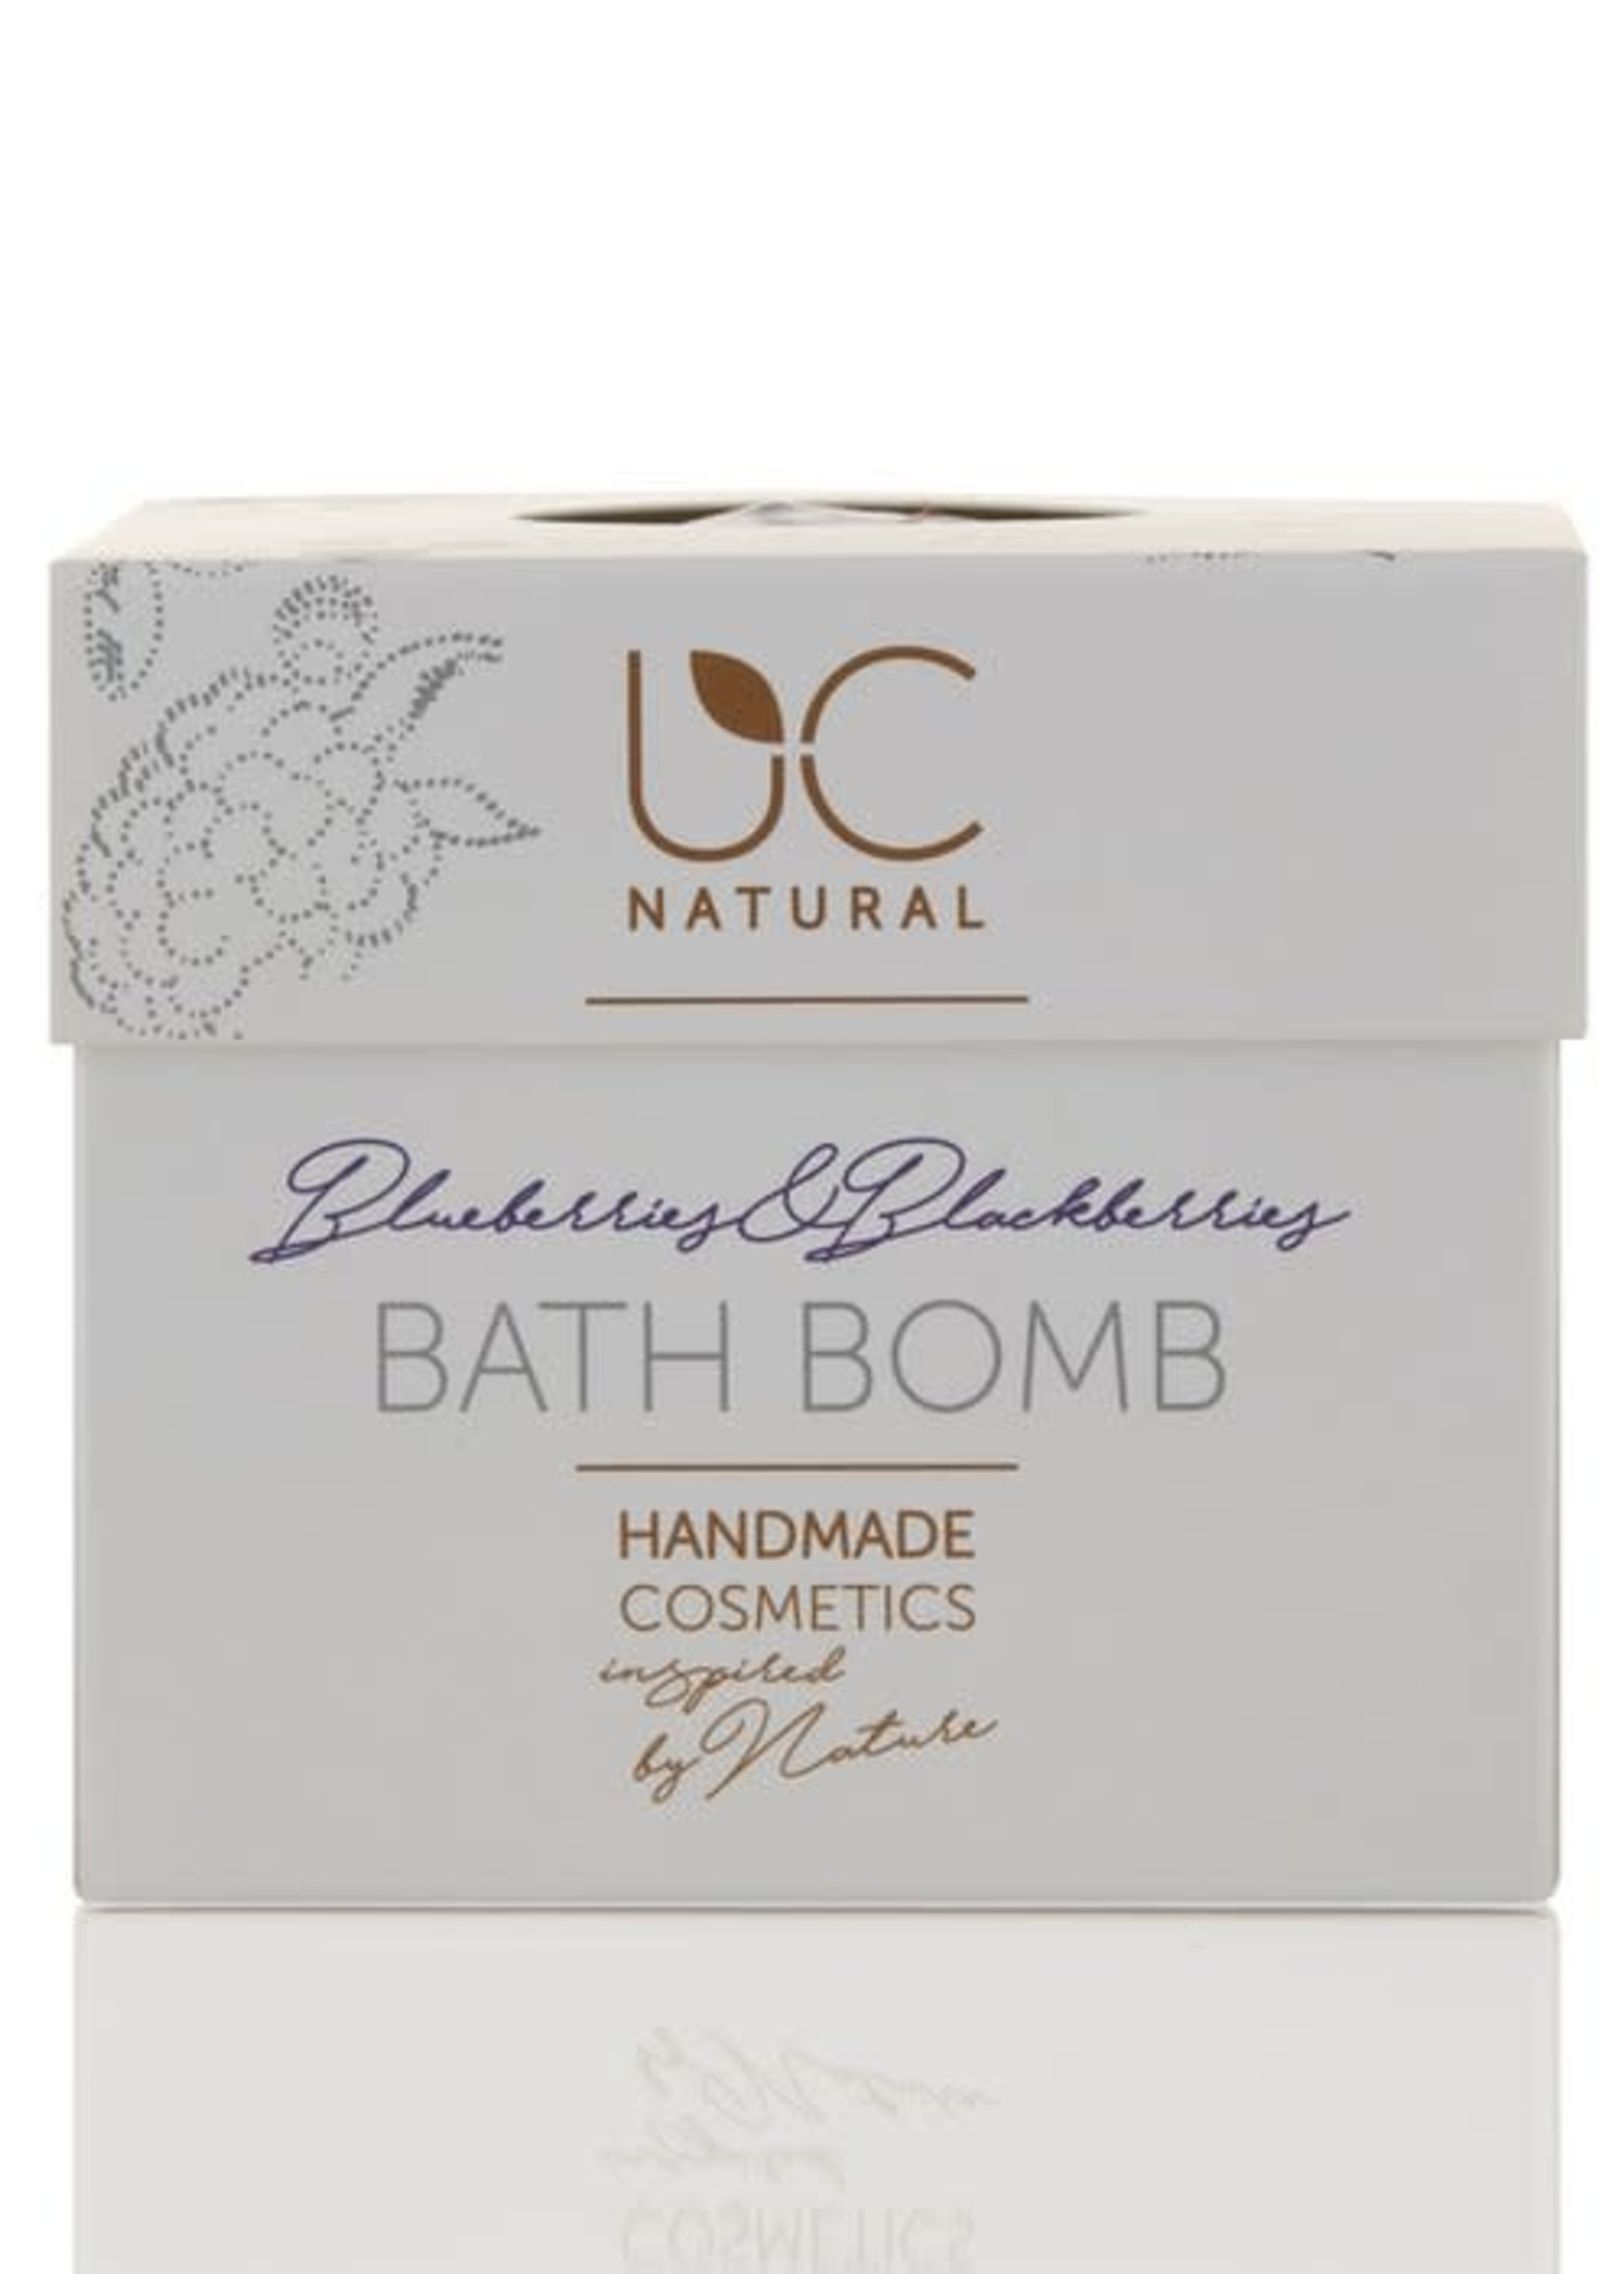 UC Naturel UC Natural - Bath Bomb - Blueberries & Blackberries - badbruisbal